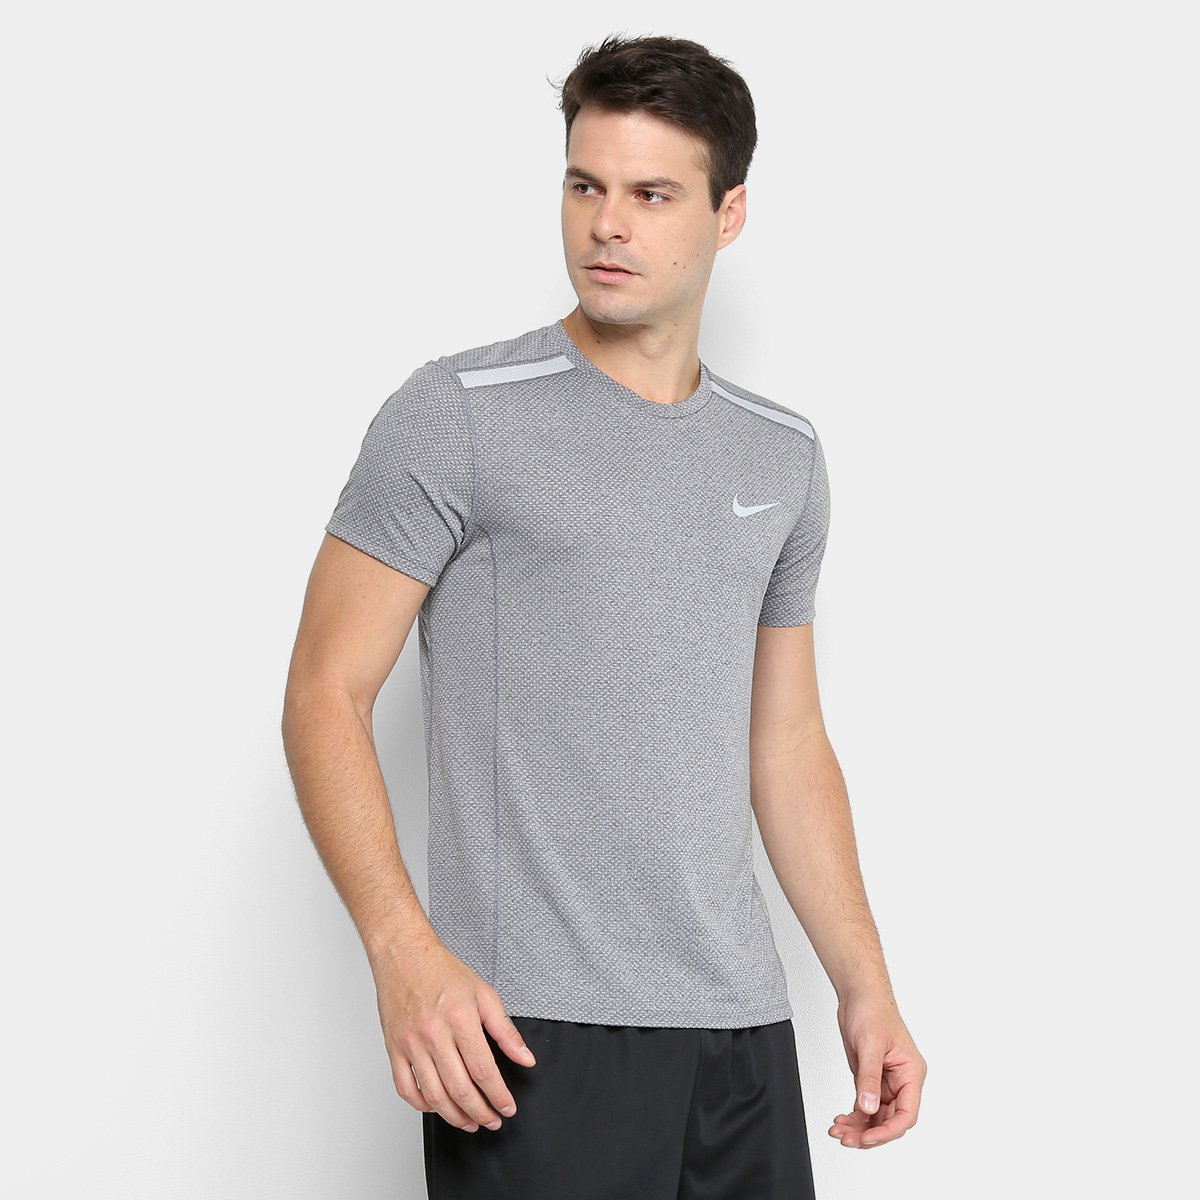 dacb03a2b702d Camiseta Nike Dry Cool Miler SS Masculina - Cinza - Compre Agora ...